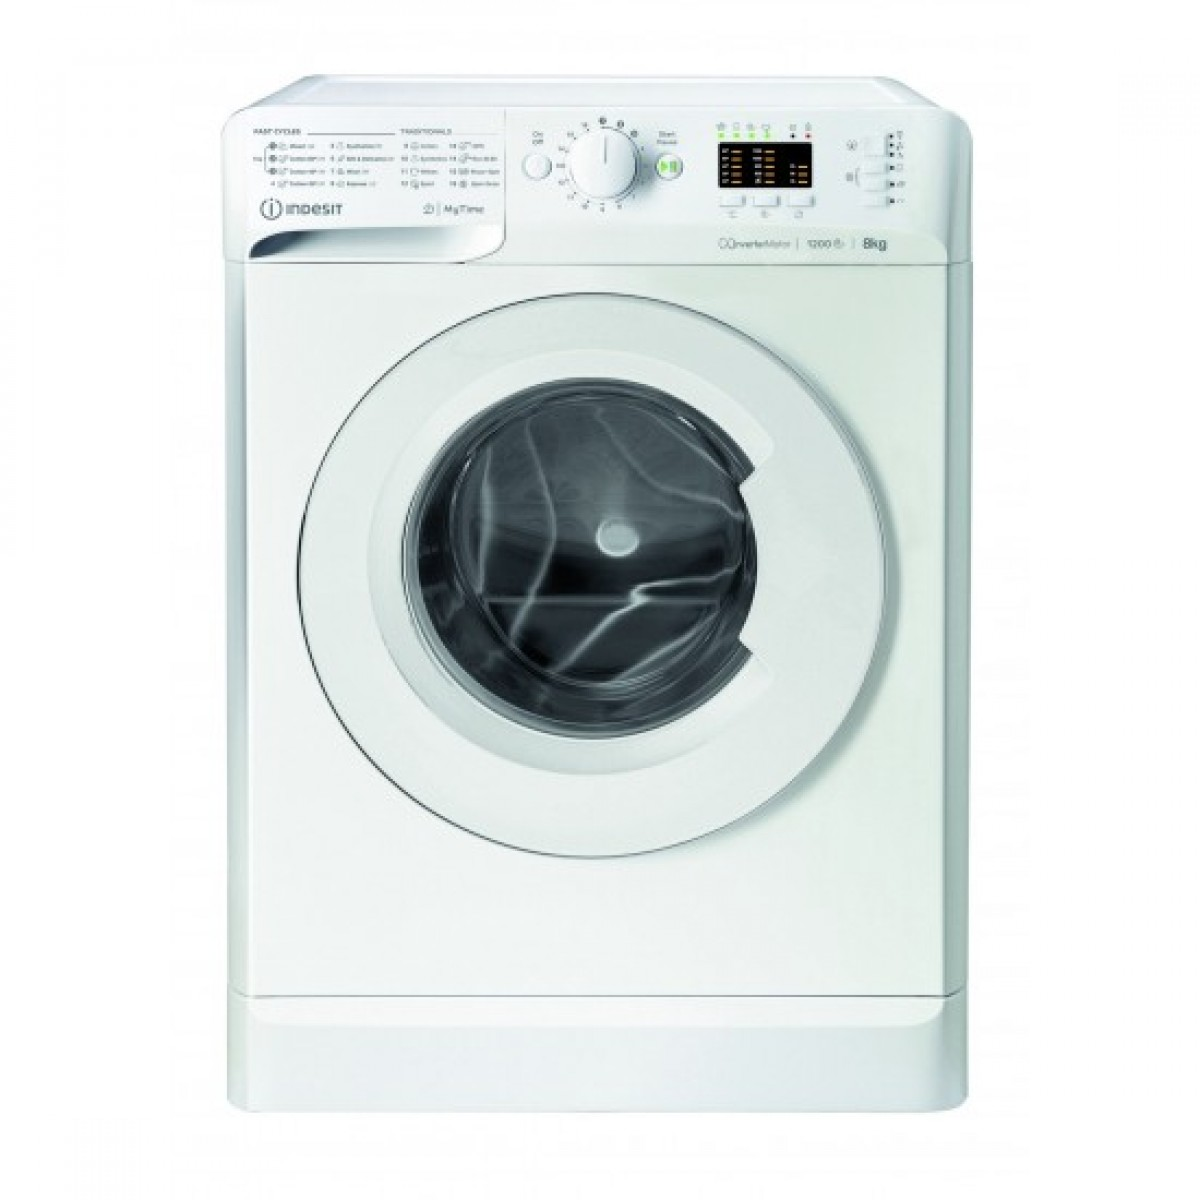 Indesit Πλυντήριο ρούχων 8kg A+++ MTWA 81283 W EE  Πλυντήρια ρούχων Ηλεκτρικες Συσκευες - homeelectrics.gr